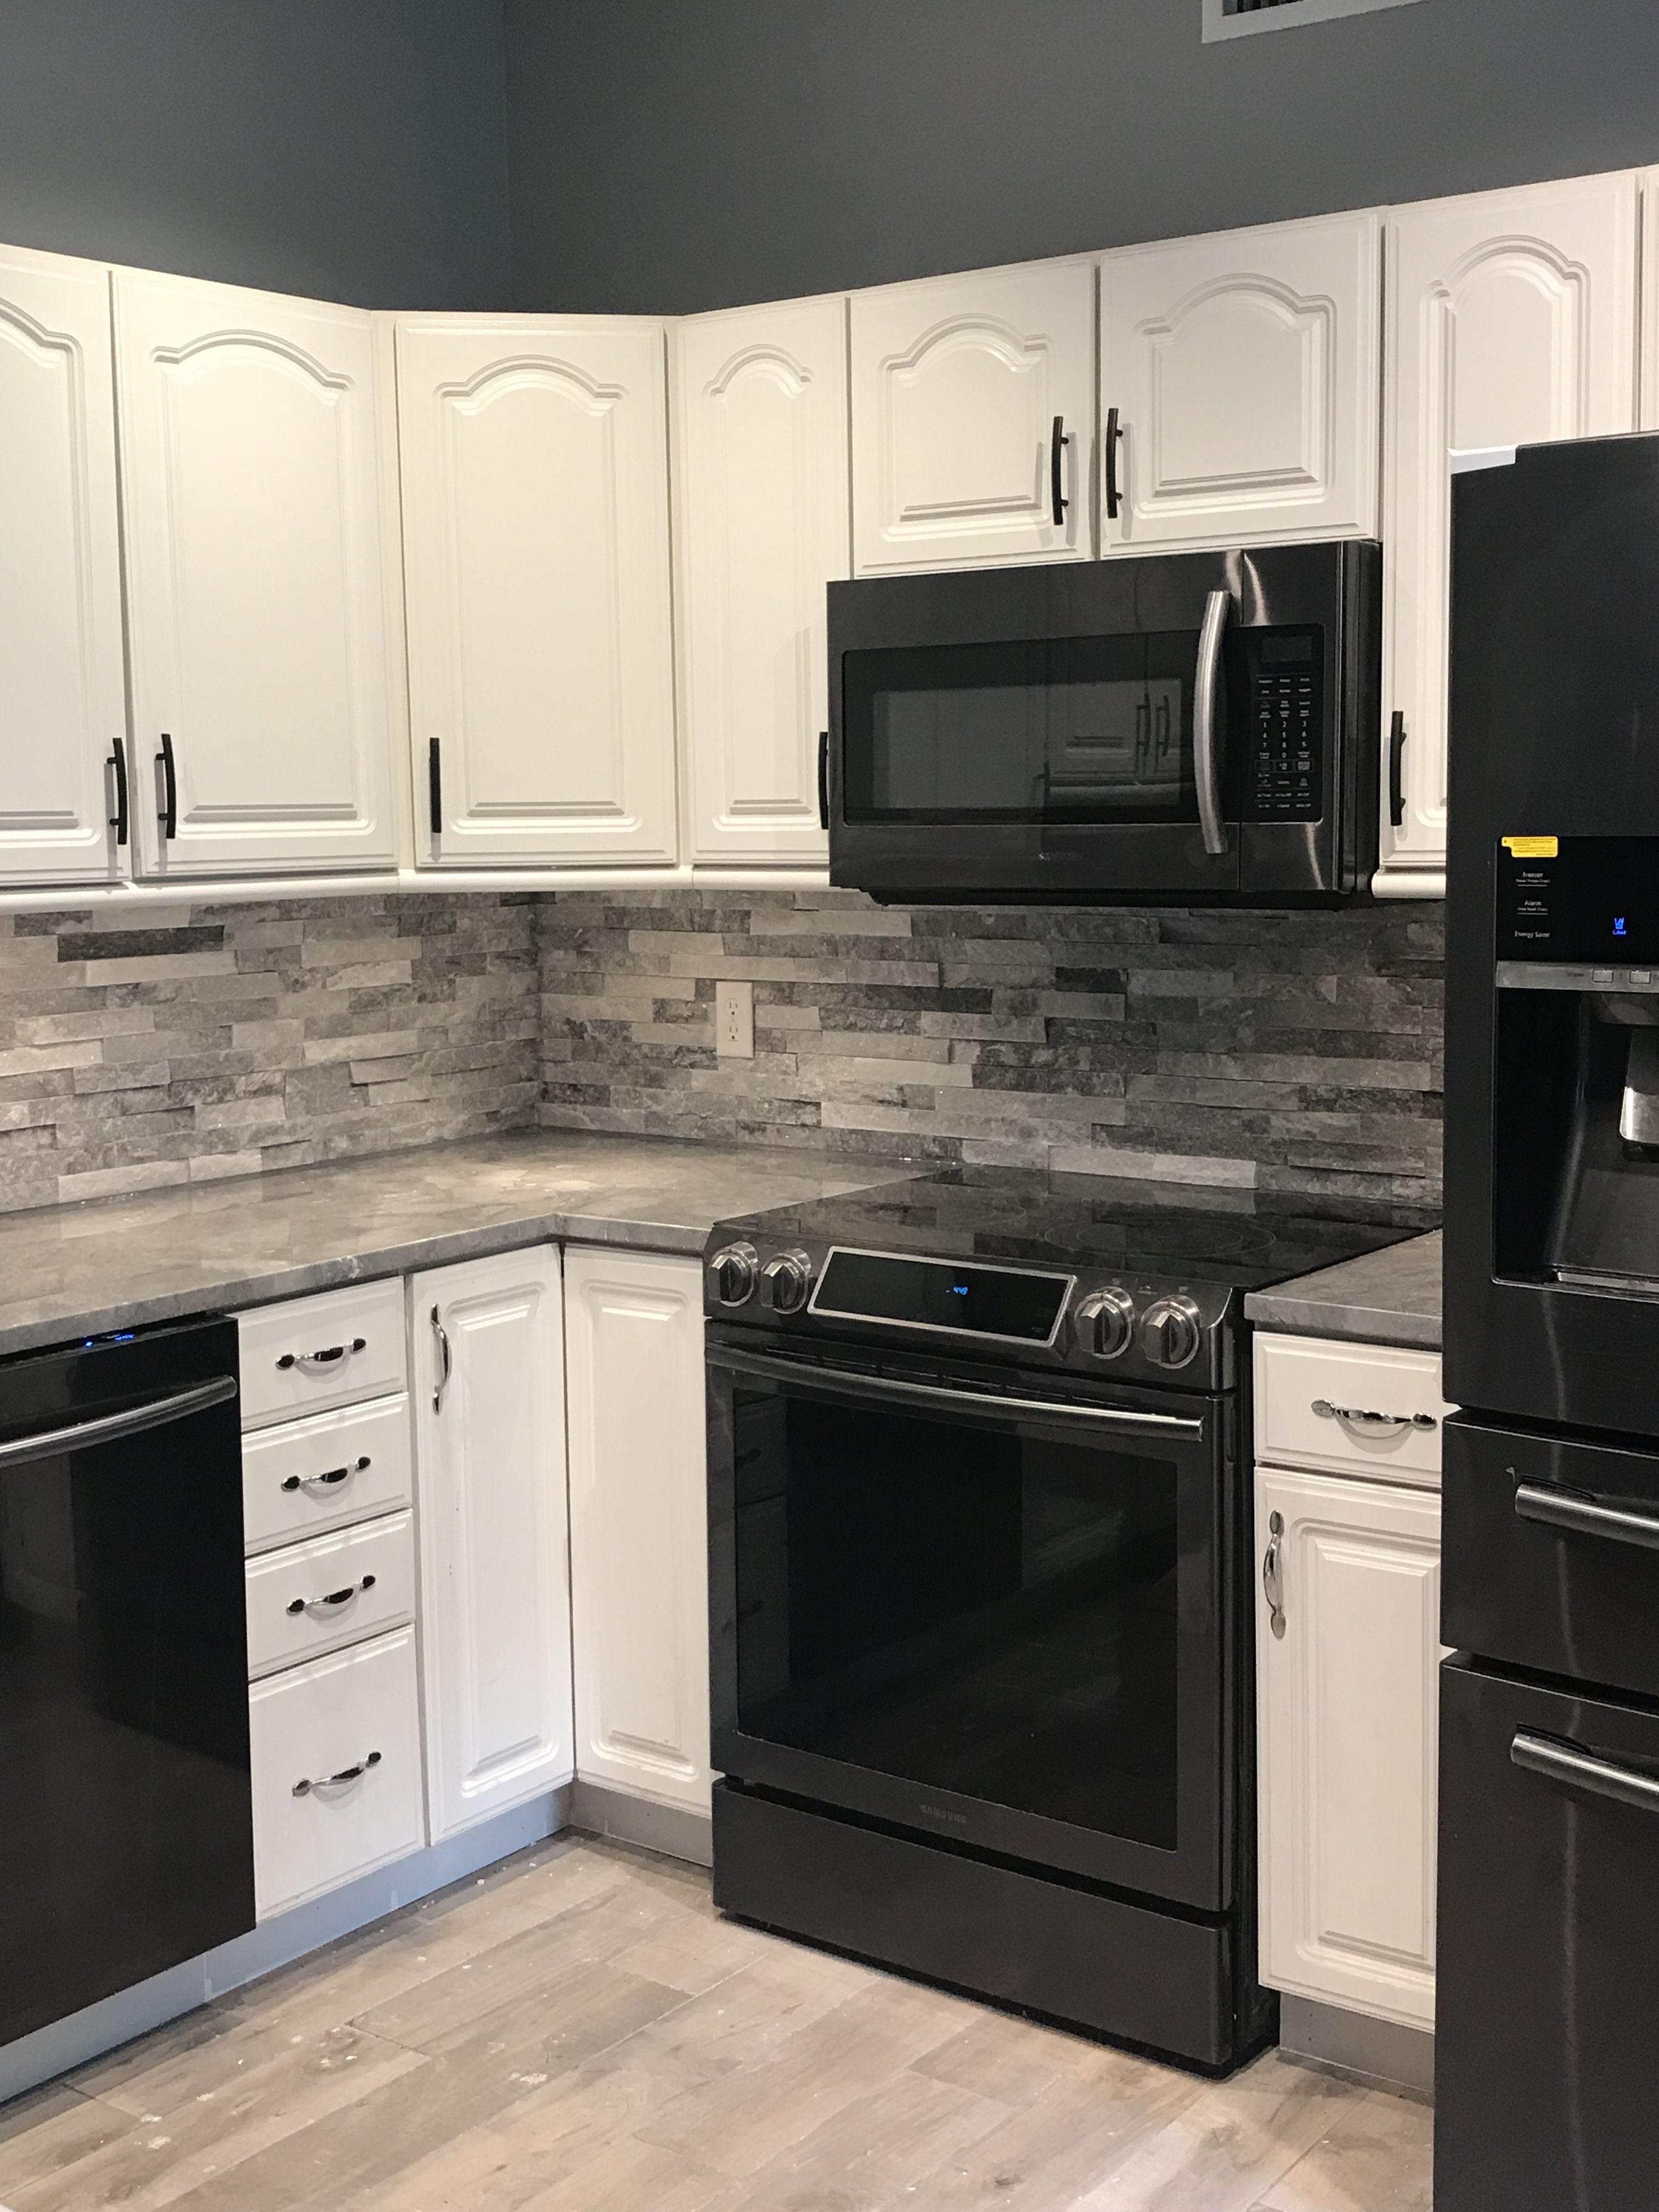 Stackstone Backsplash Black Stainless Appliances White Cabinets